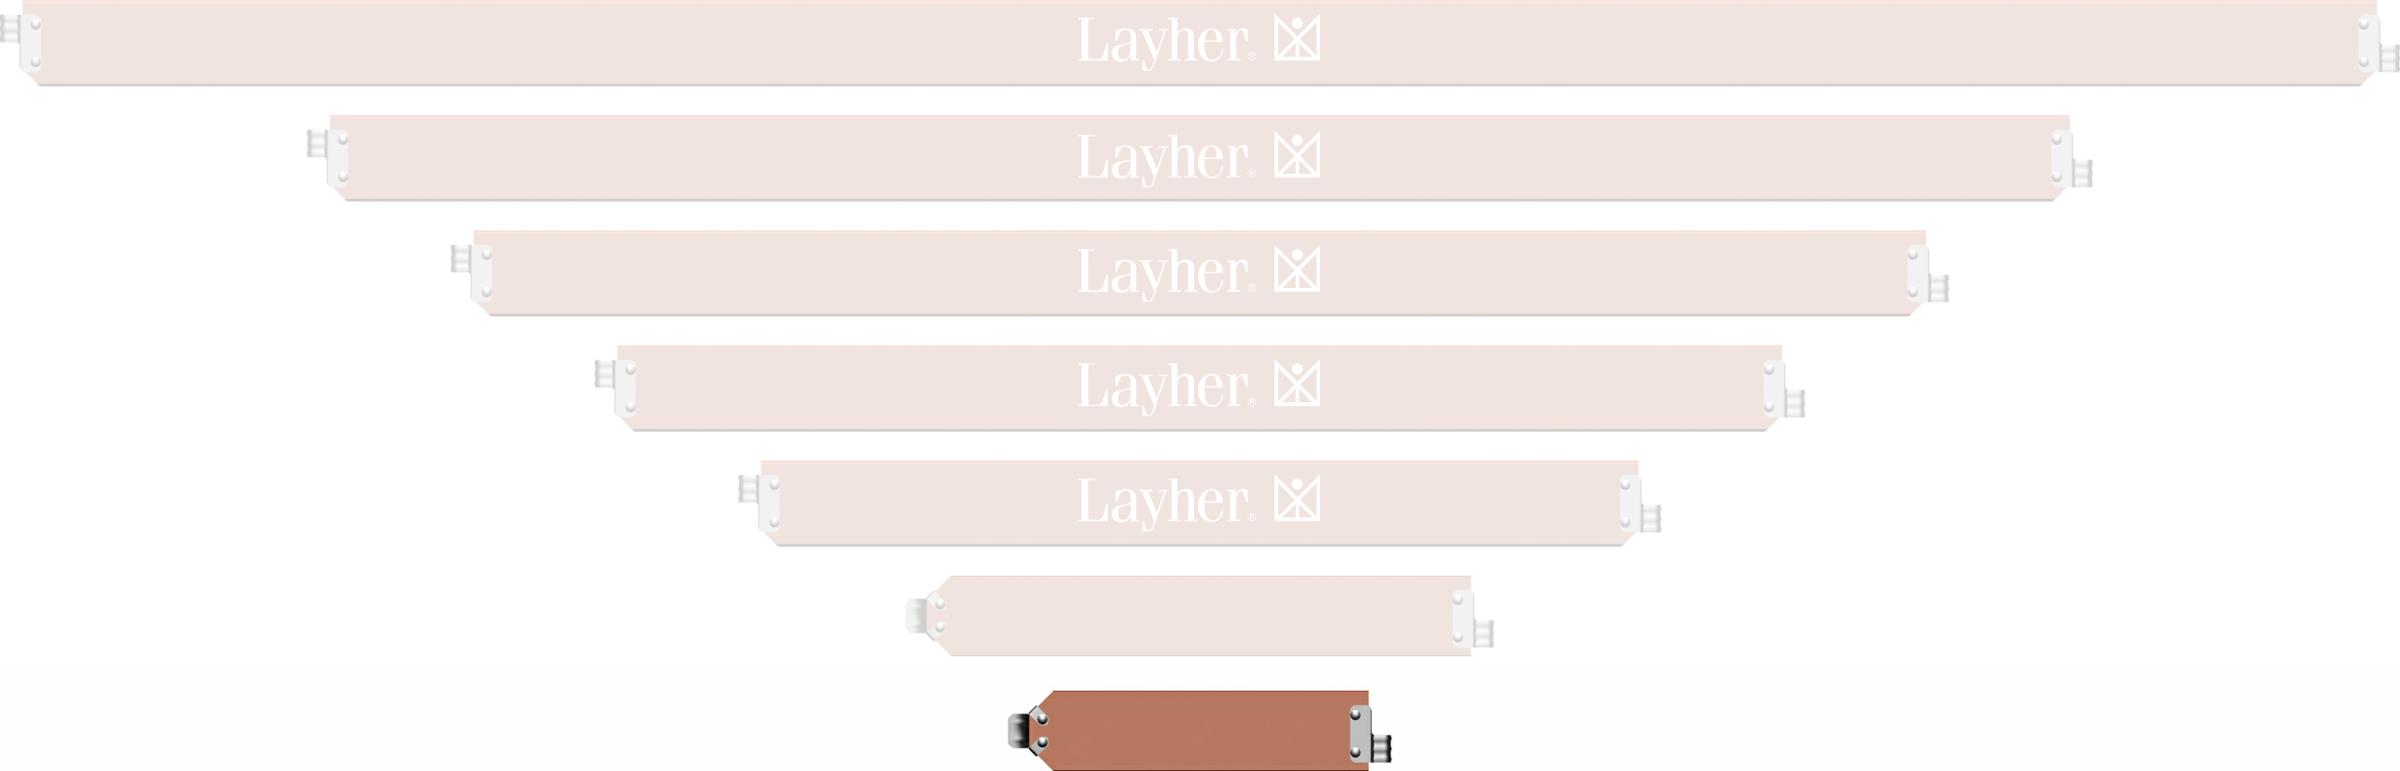 Layher Blitz Bordbrett Längsseite 0,73 m